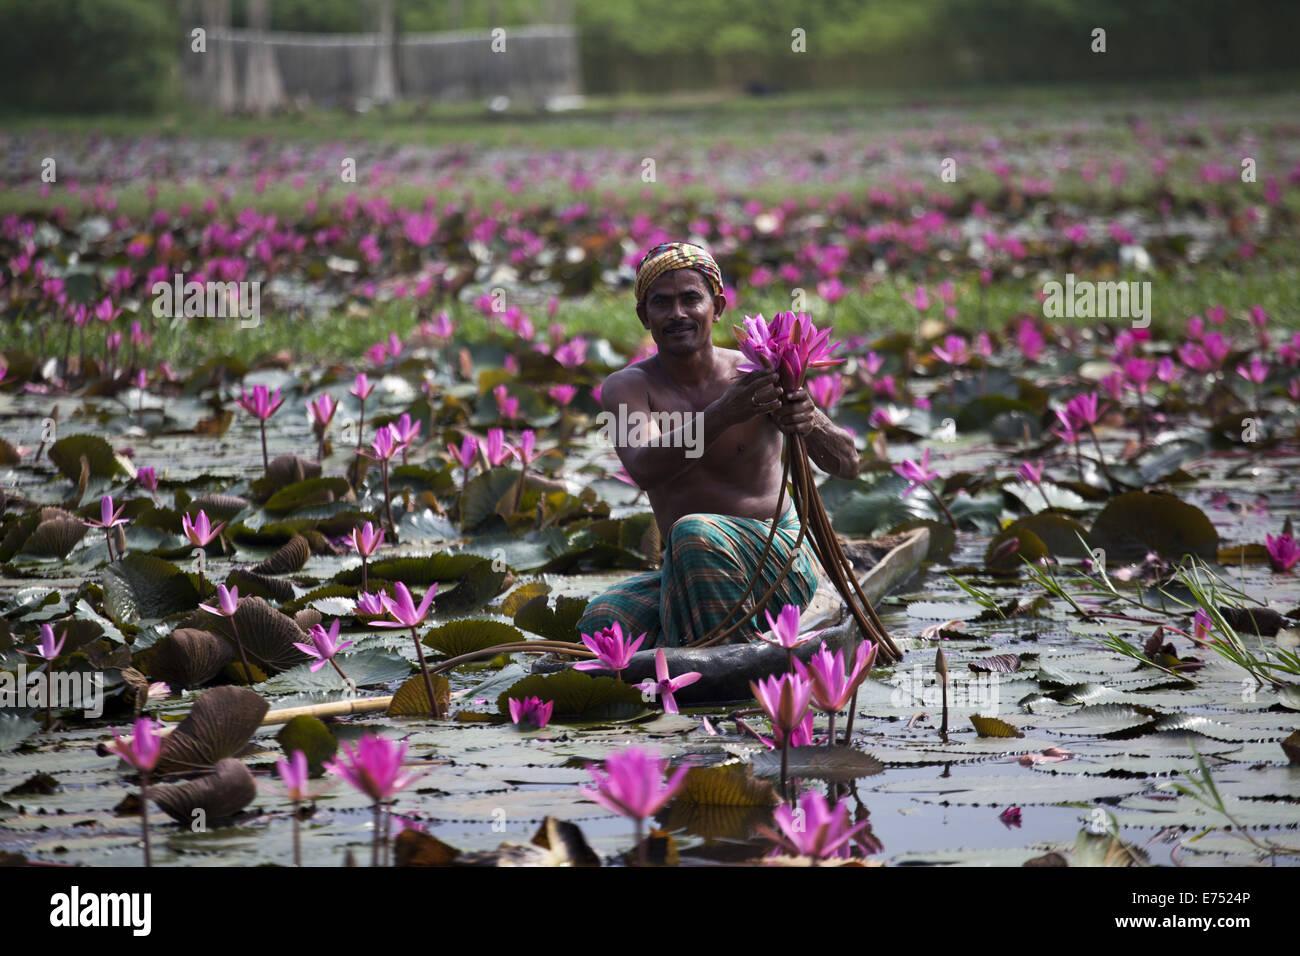 Girl selling water lilies market stock photos girl selling water 7th sep 2013 water lily the national flower of izmirmasajfo